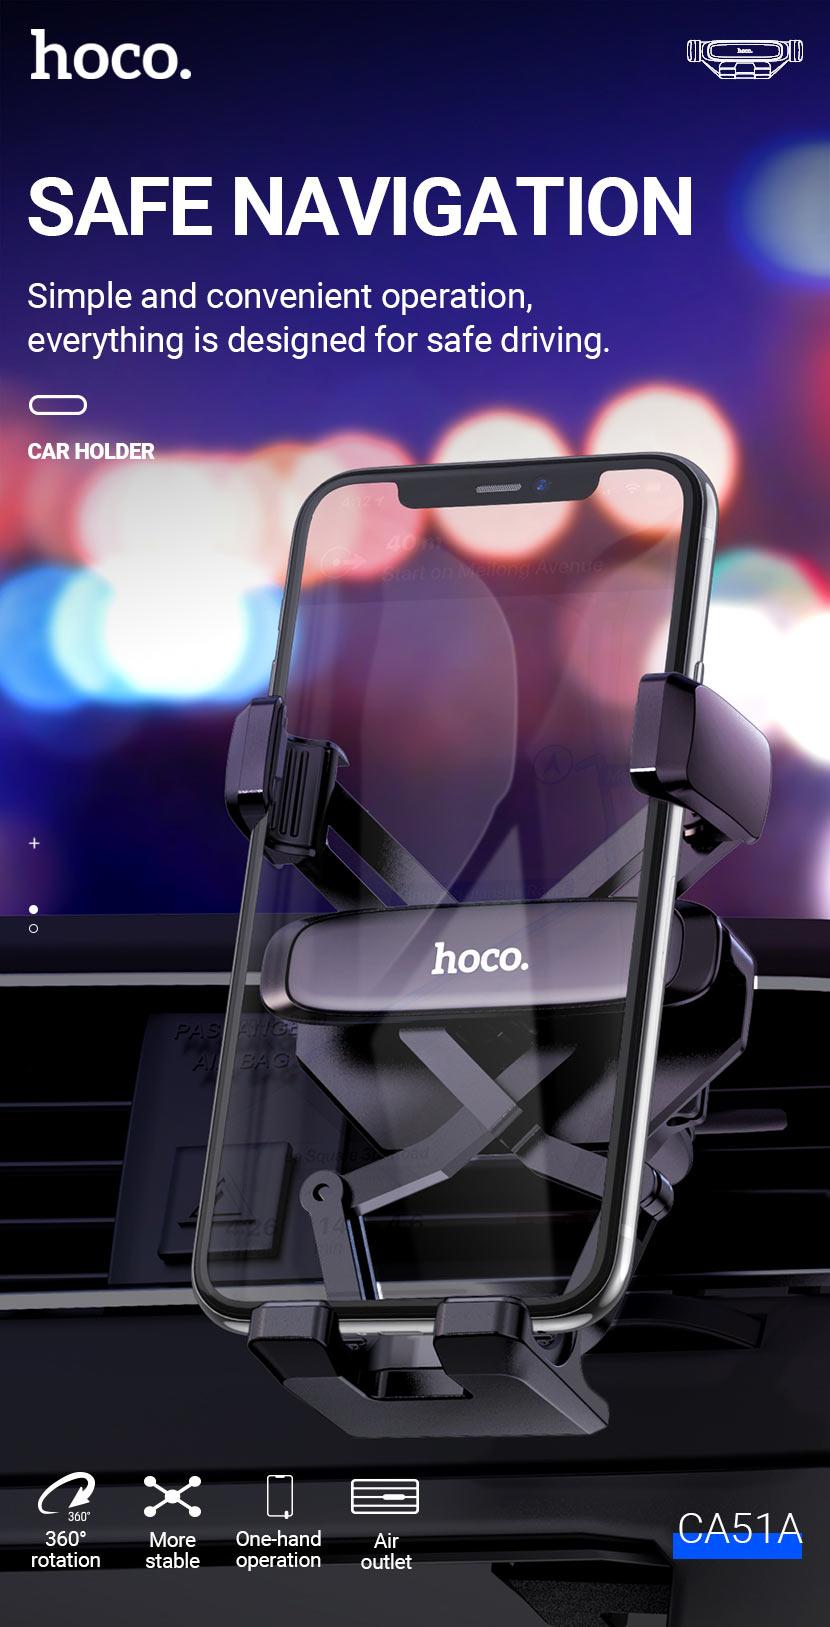 hoco news ca51a tour gravity linkage car holder safe en